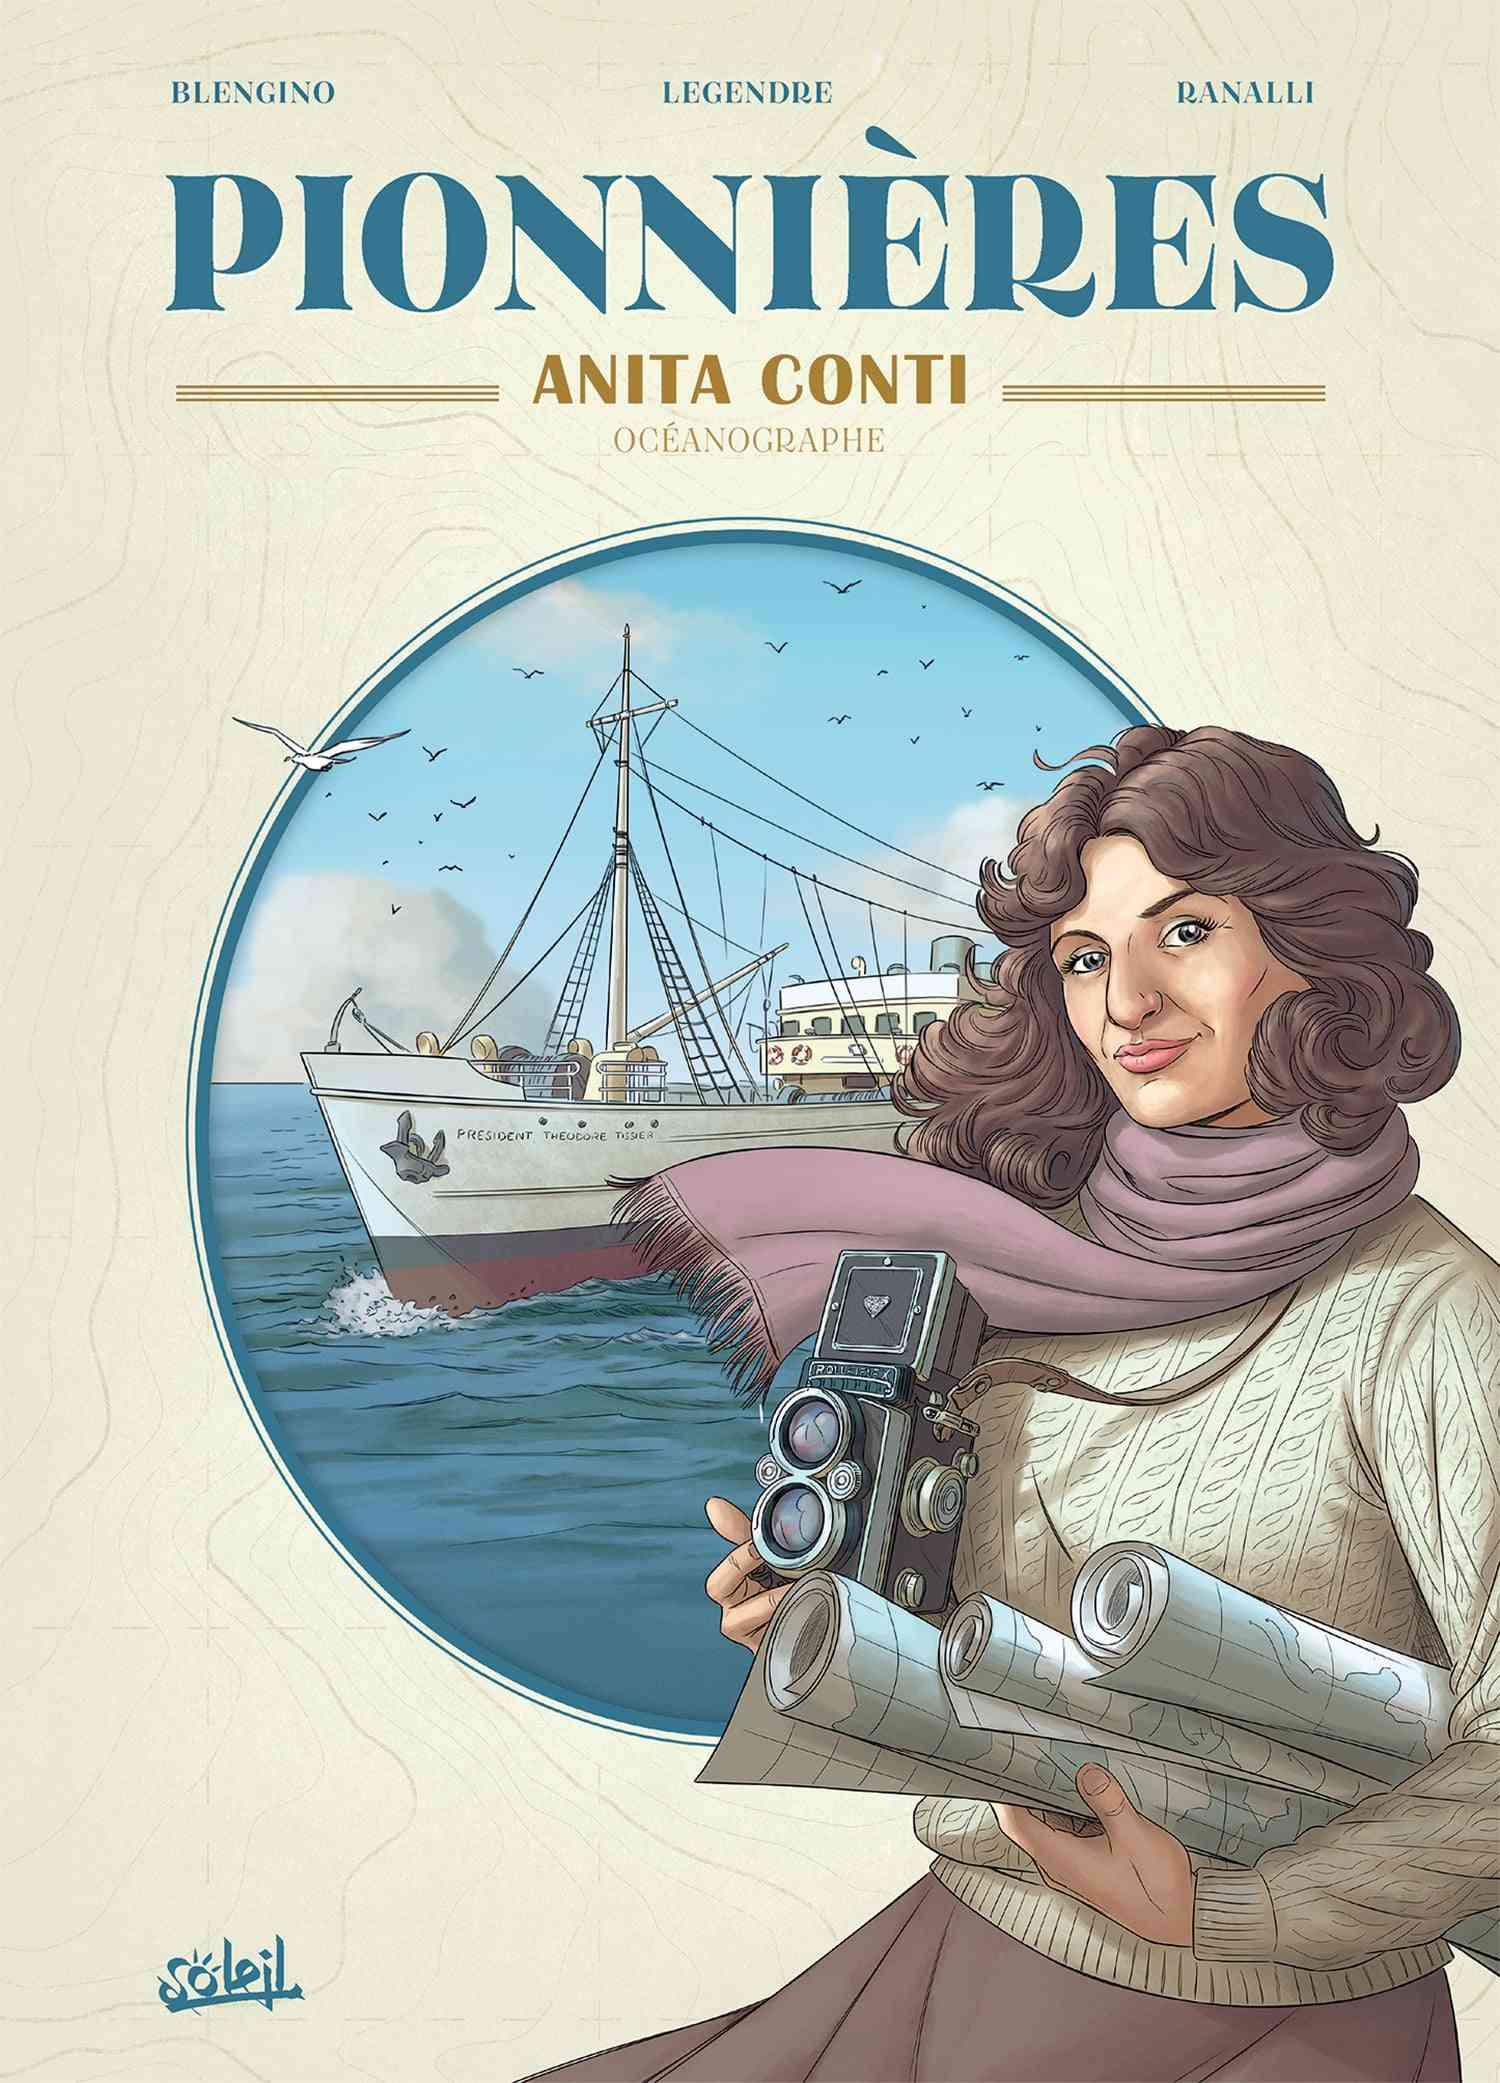 Pionnières, Anita Conti grande dame de la mer